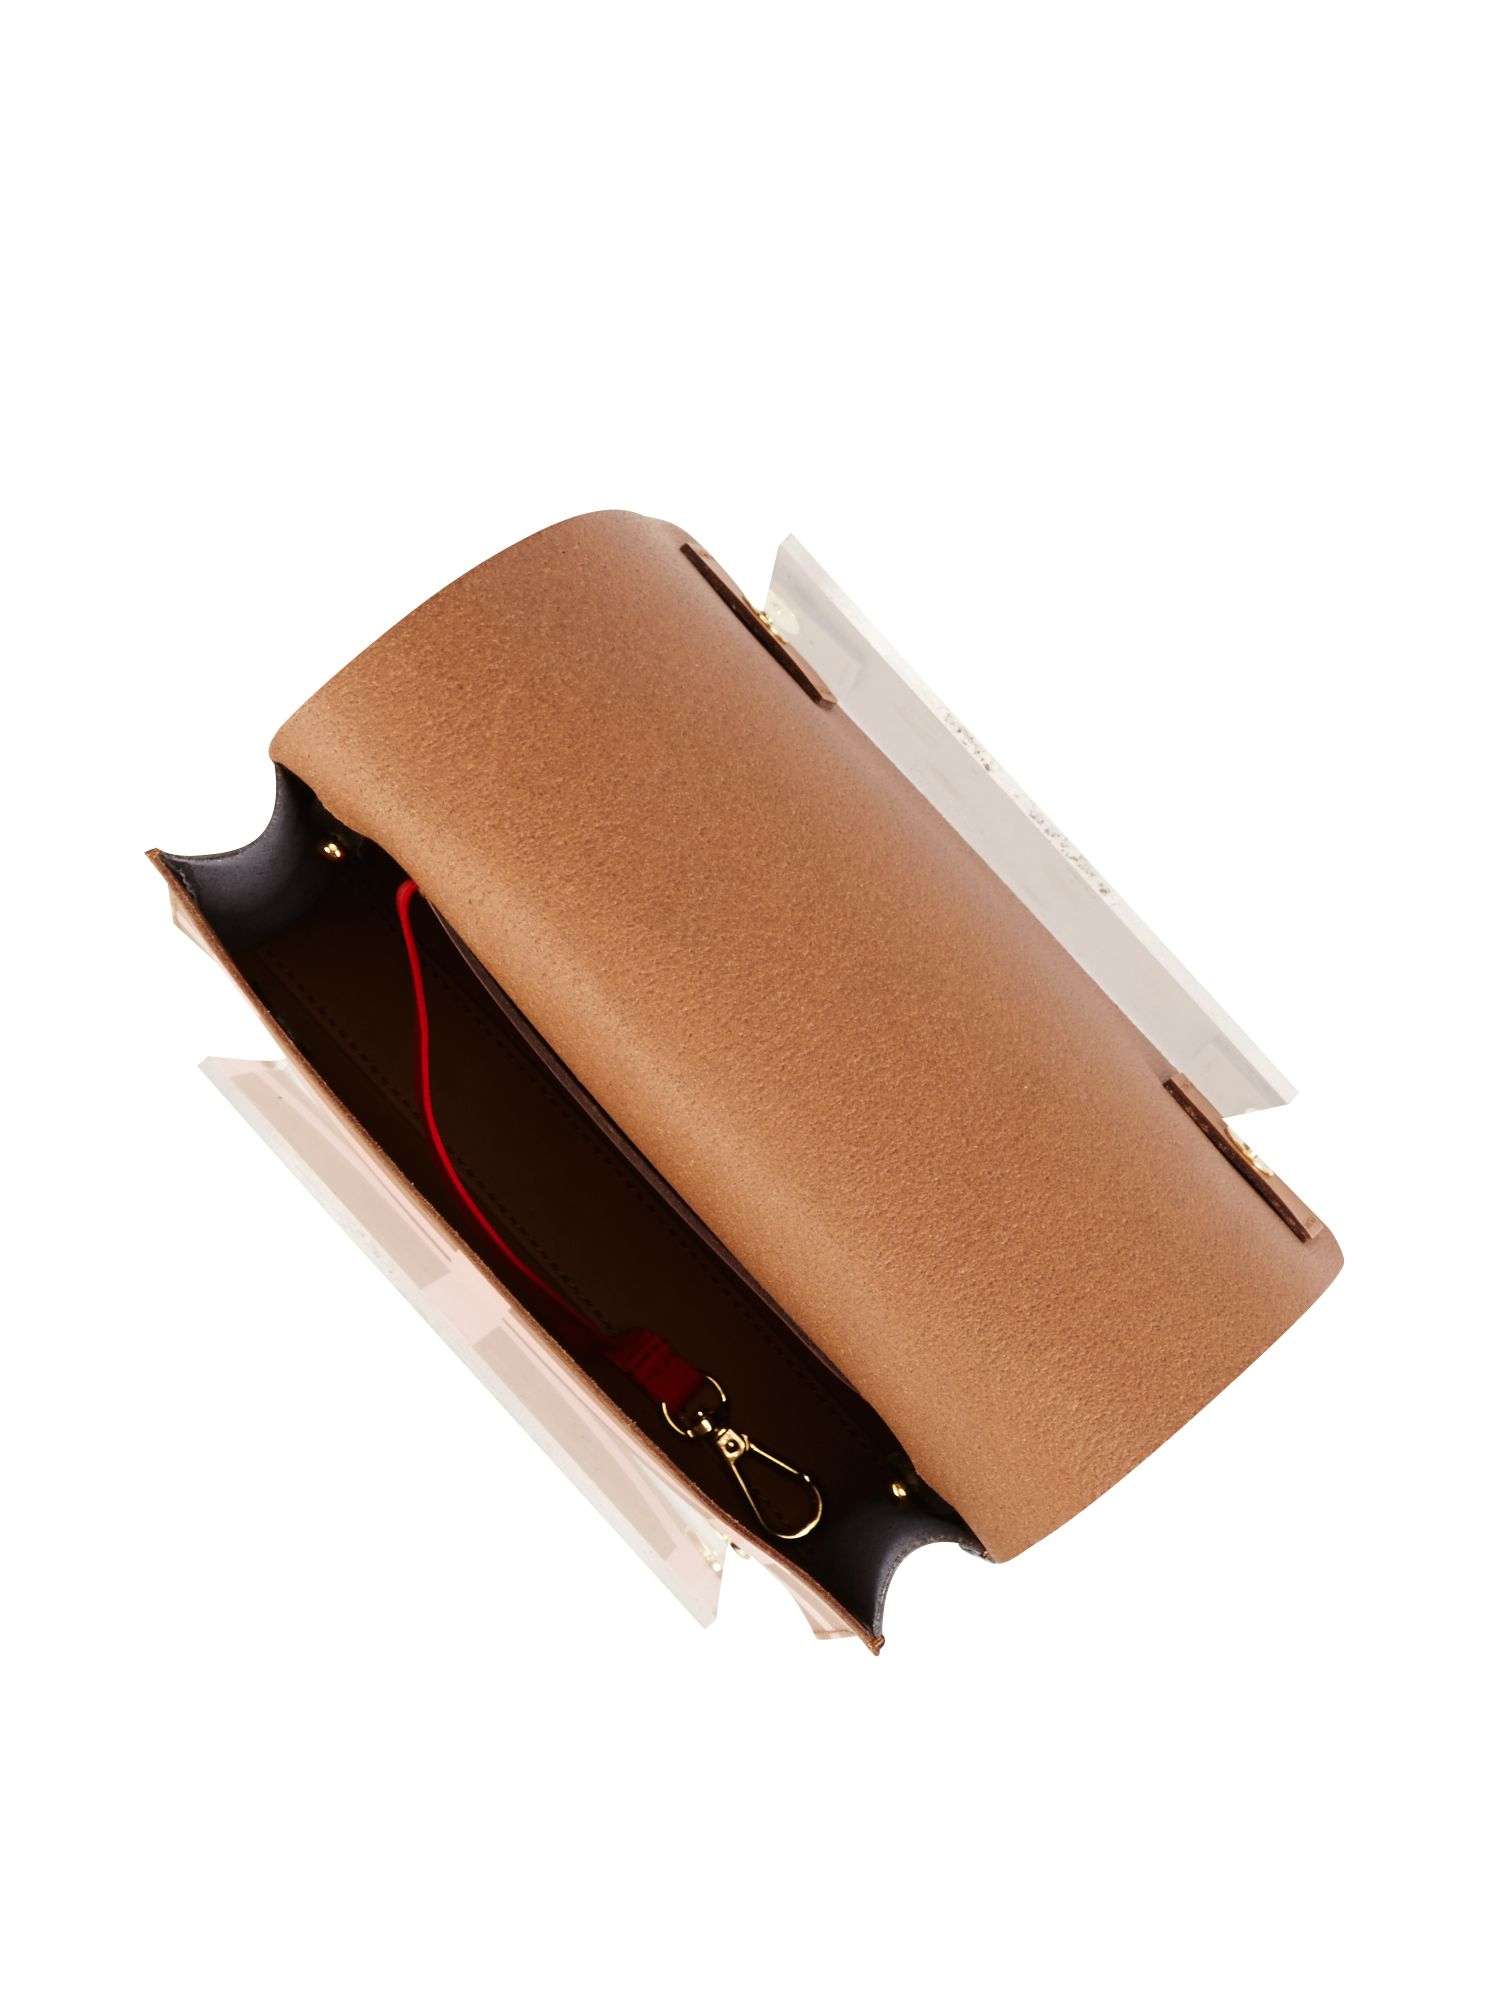 Orla Kiely Iphone S Wallet